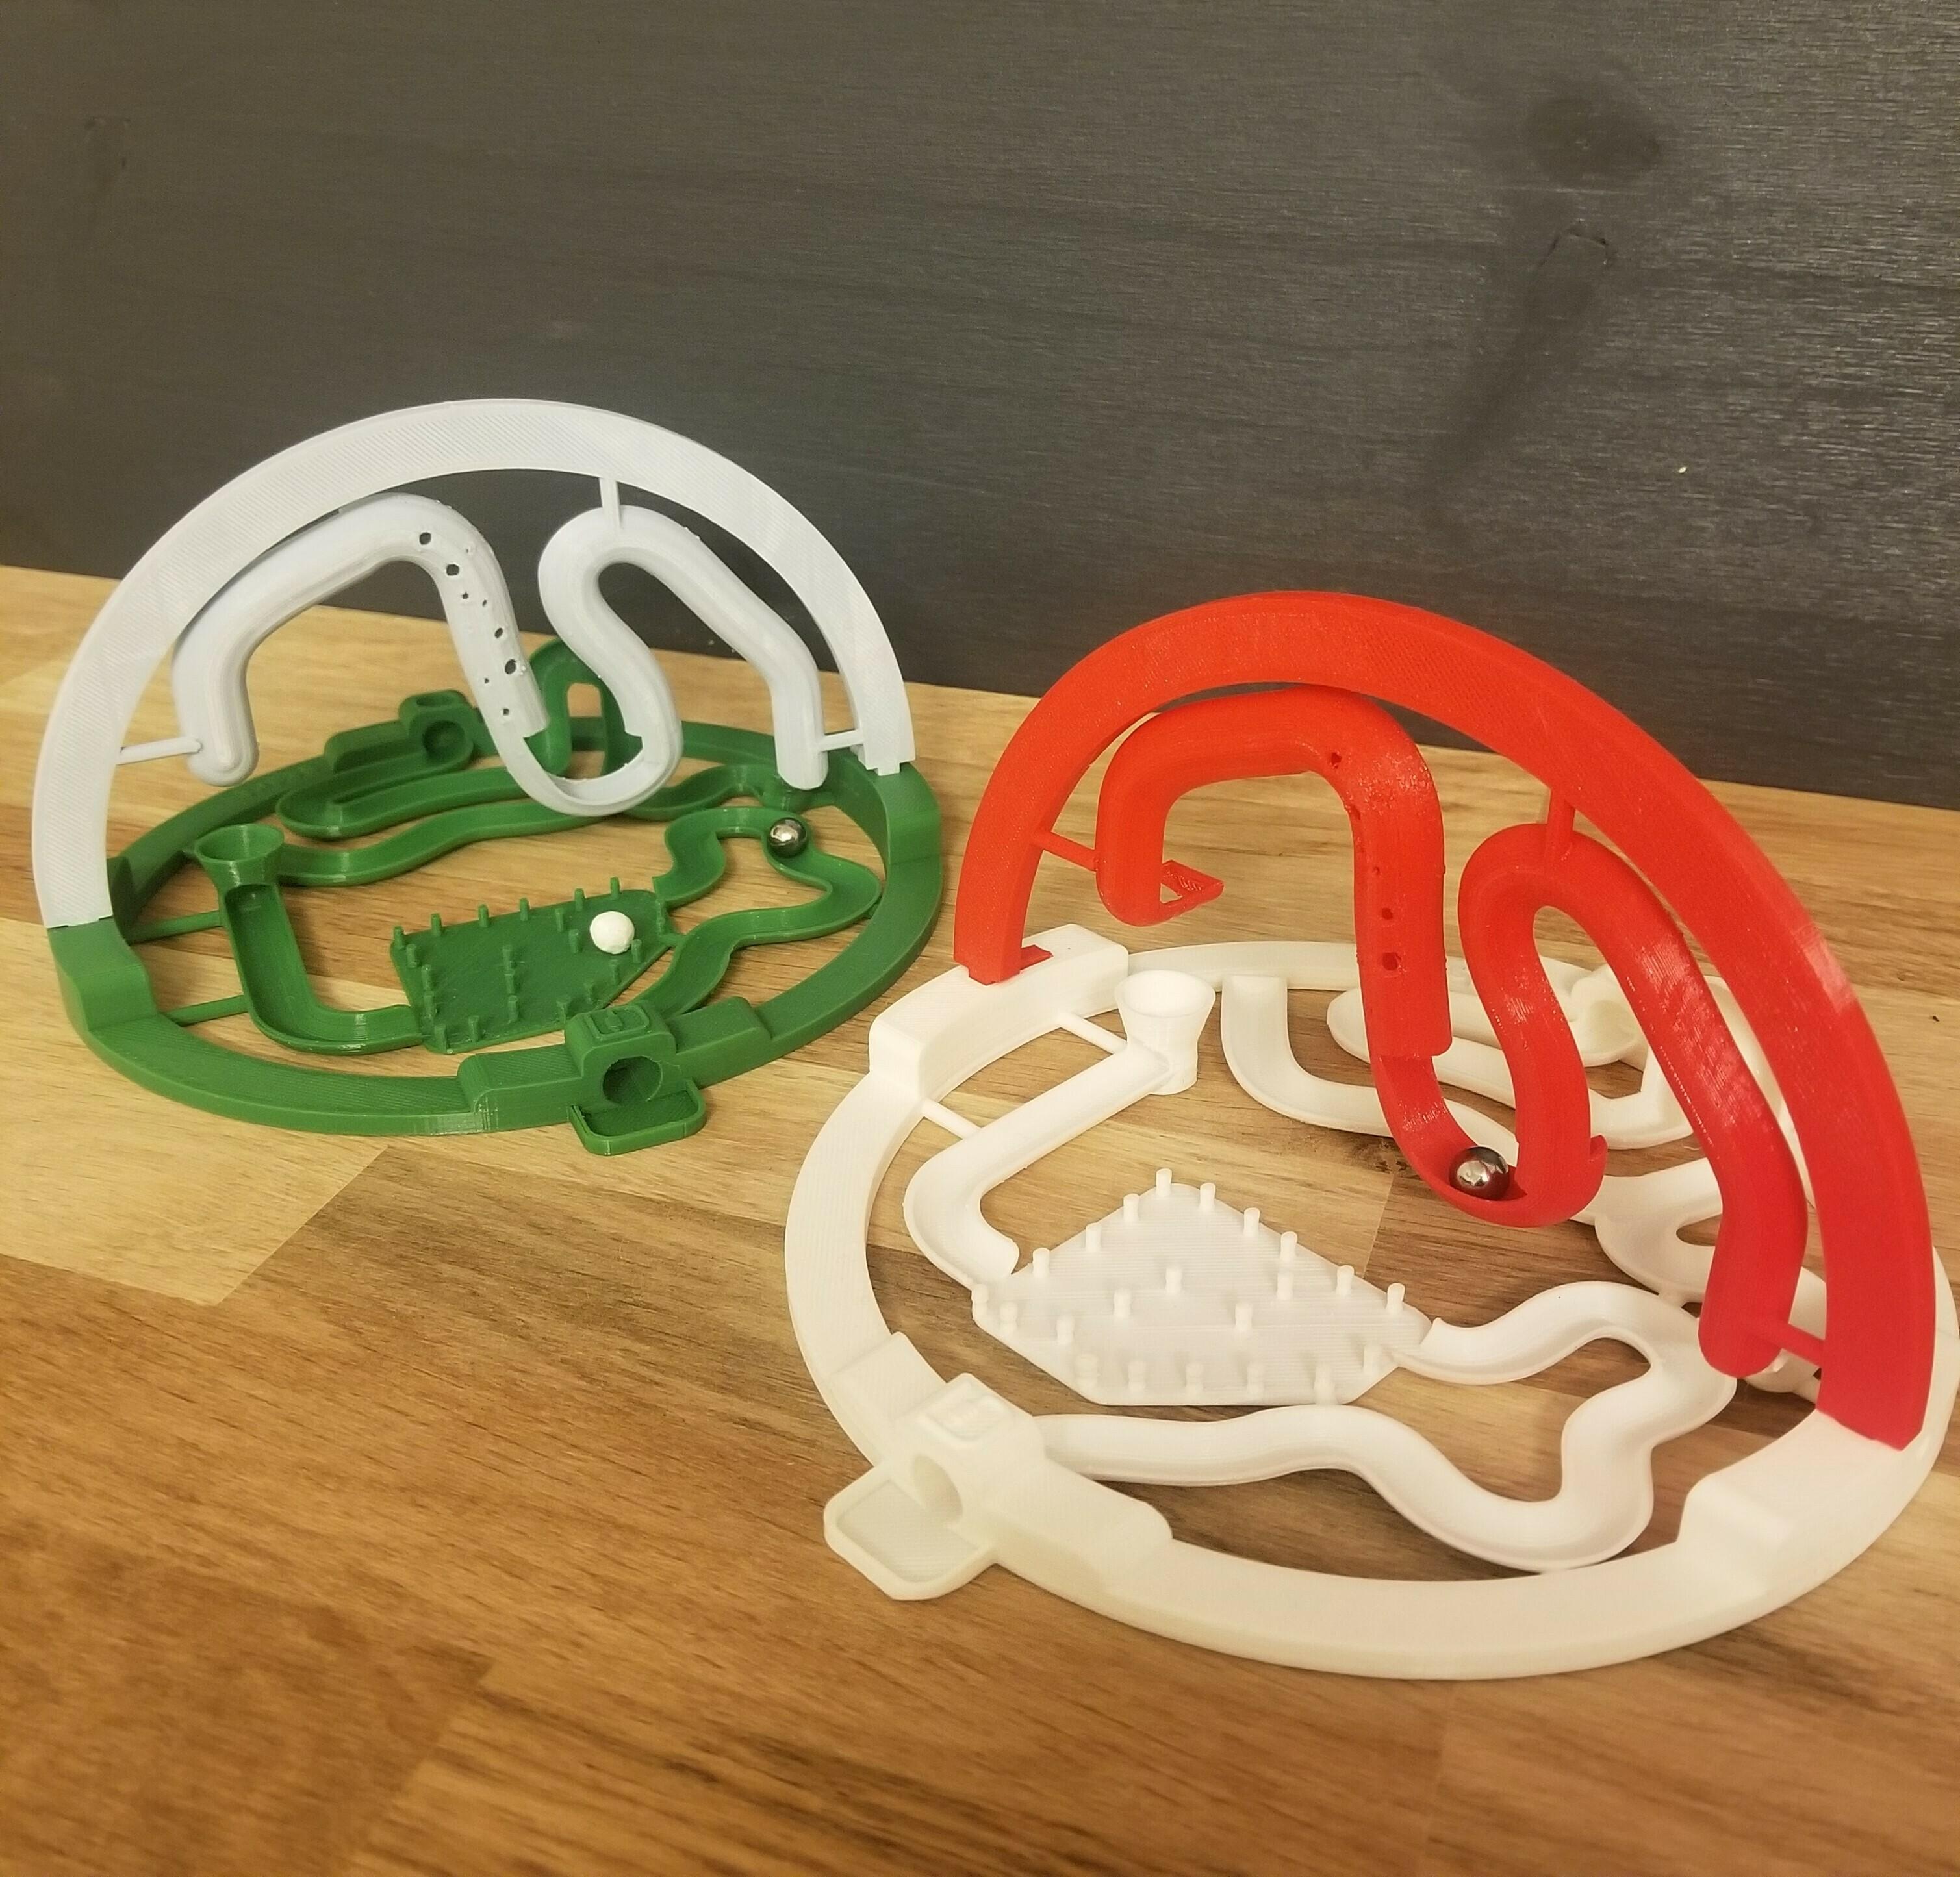 20201220_190127.jpg Download STL file 3D ball course • 3D printer template, LouD3D